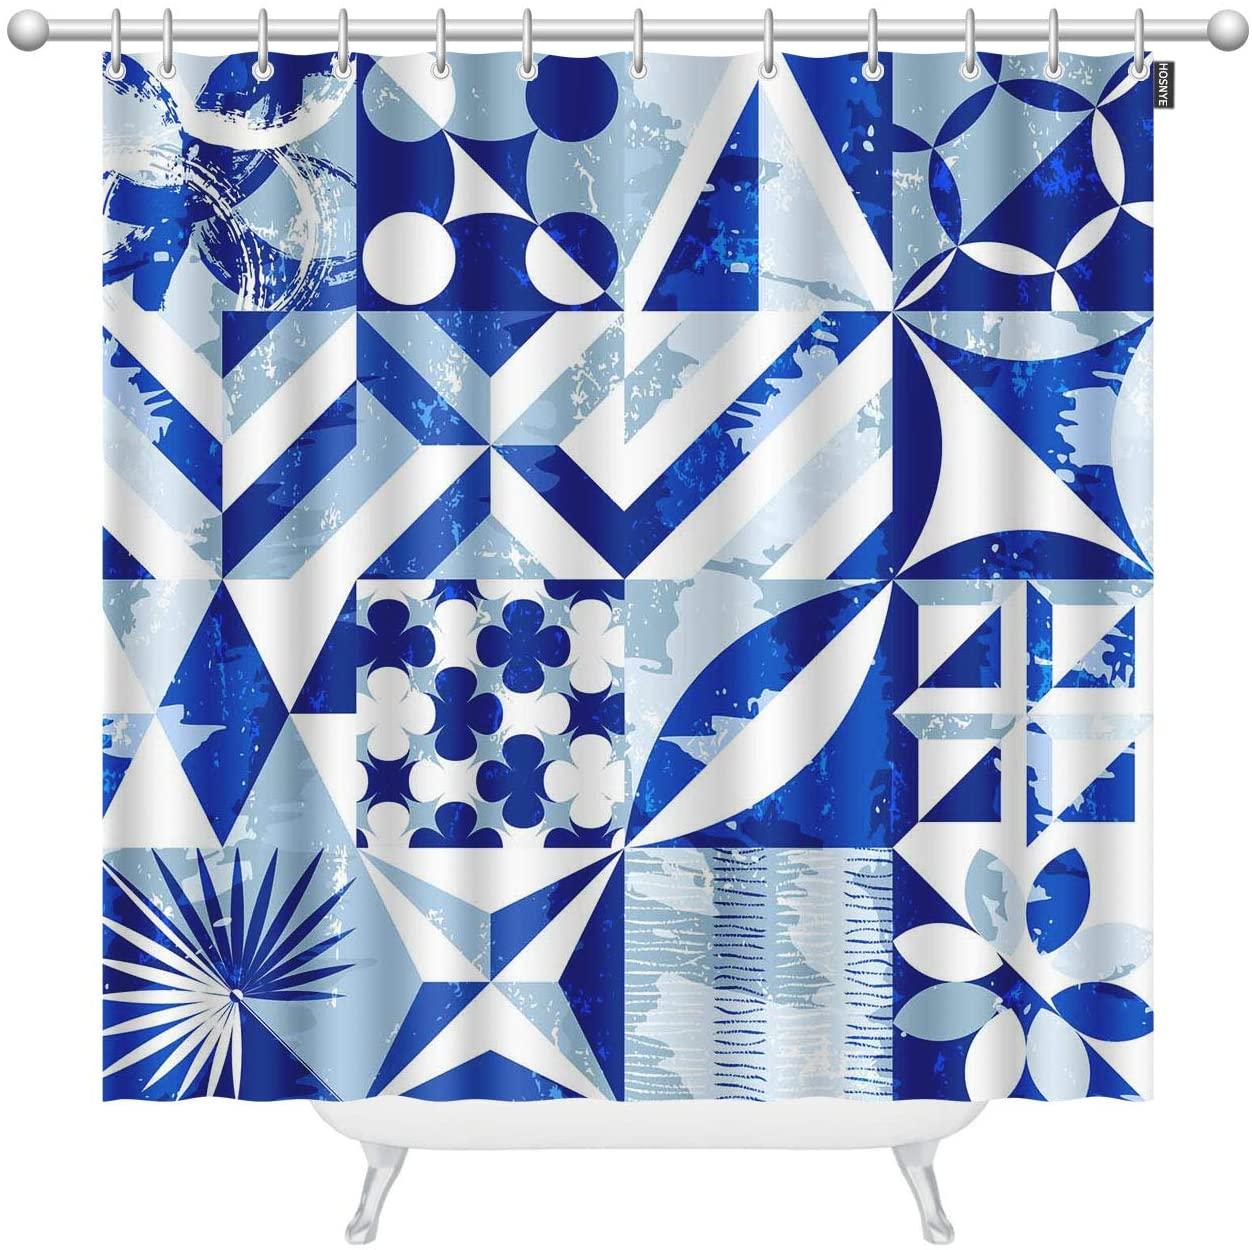 HOSNYE Blue Rectangle Stitching Extra Long Fabric Shower Curtain 72 x 96 inch Striped Circular Polygonal Leaf Flower Pattern Shower Curtains for Bathroom